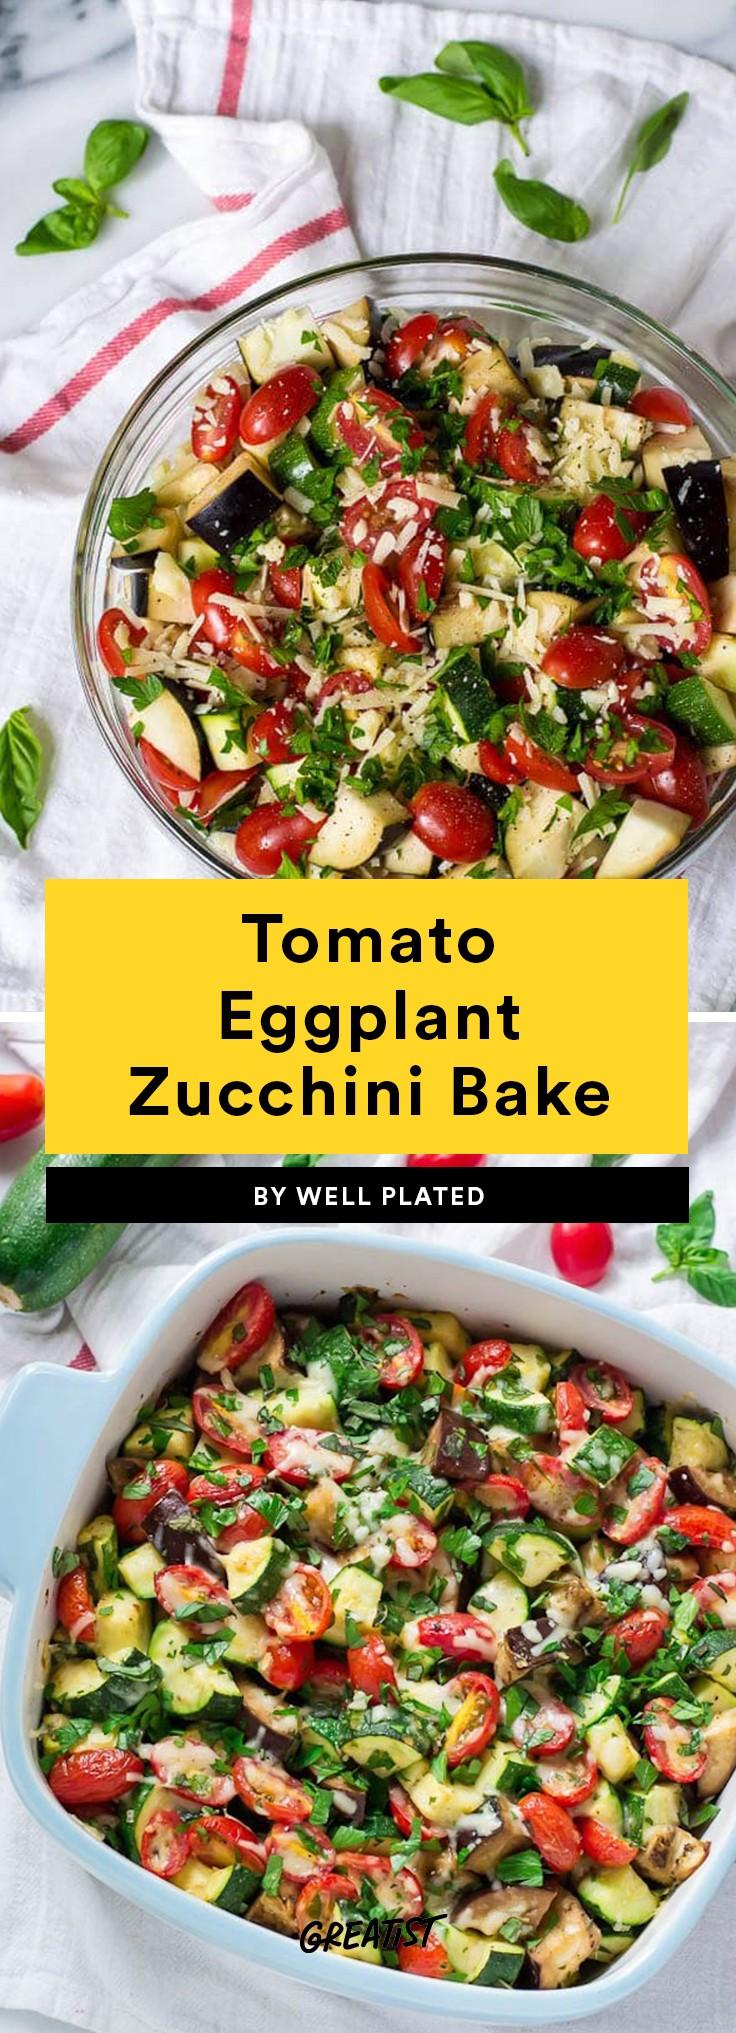 Tomato Eggplant Zucchini Bake Recipe